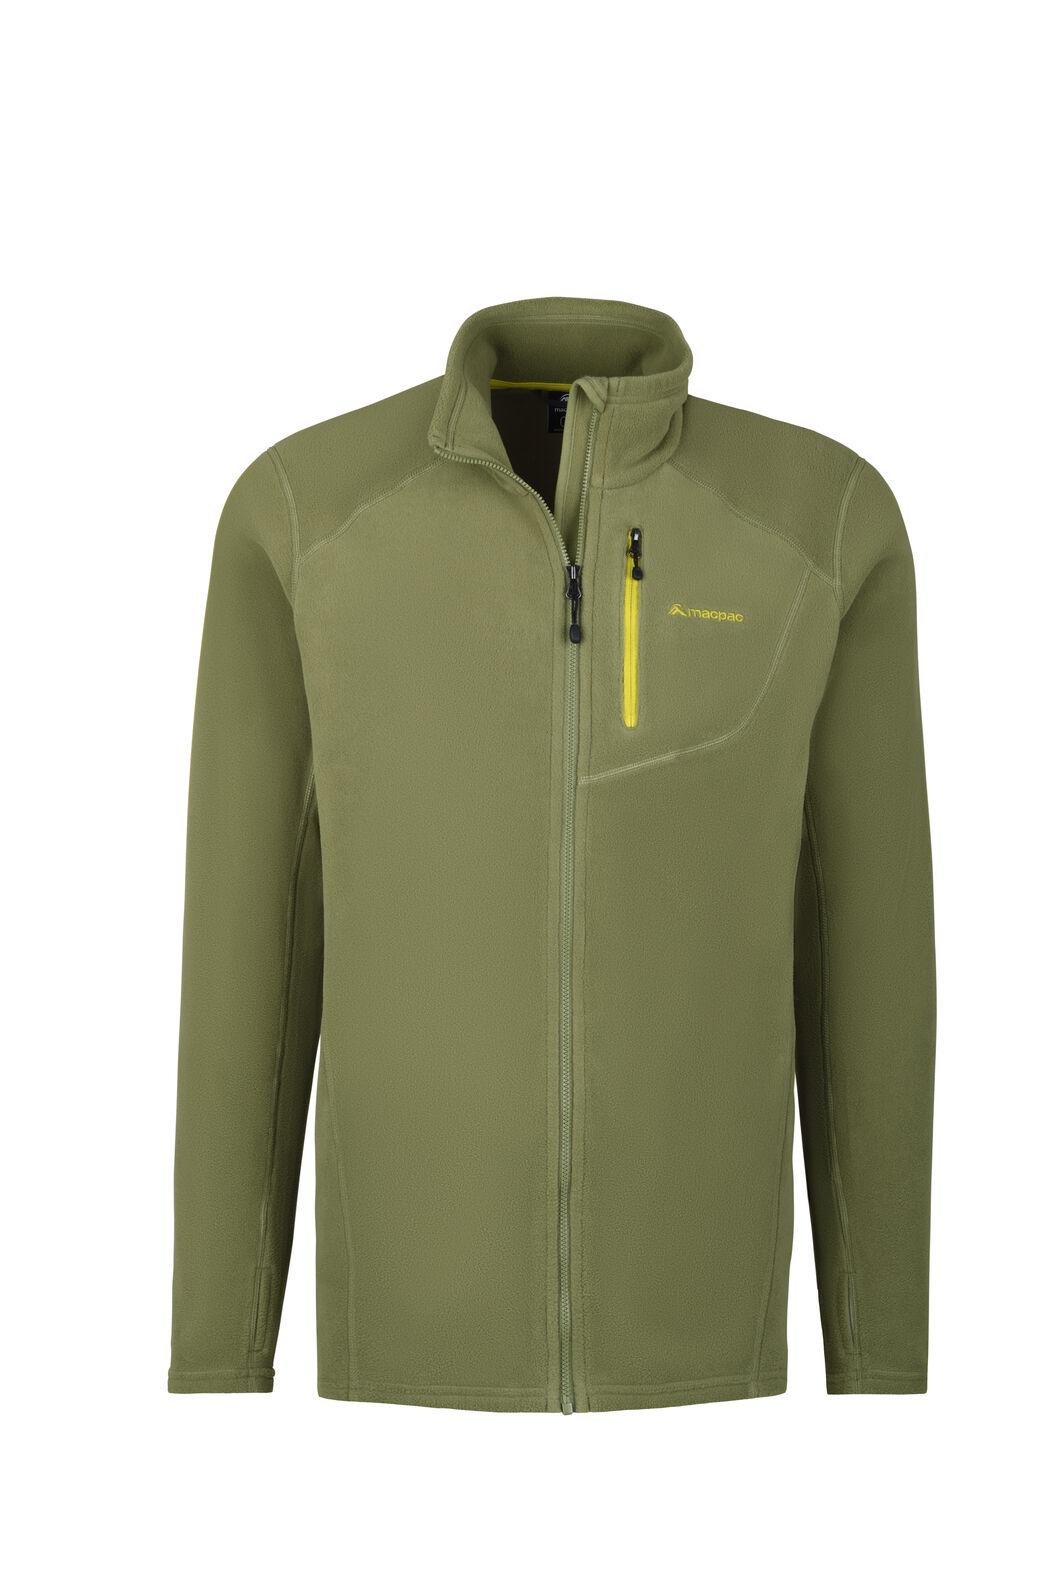 Macpac Kea Polartec® Micro Fleece® Jacket - Men's, Loden Green, hi-res